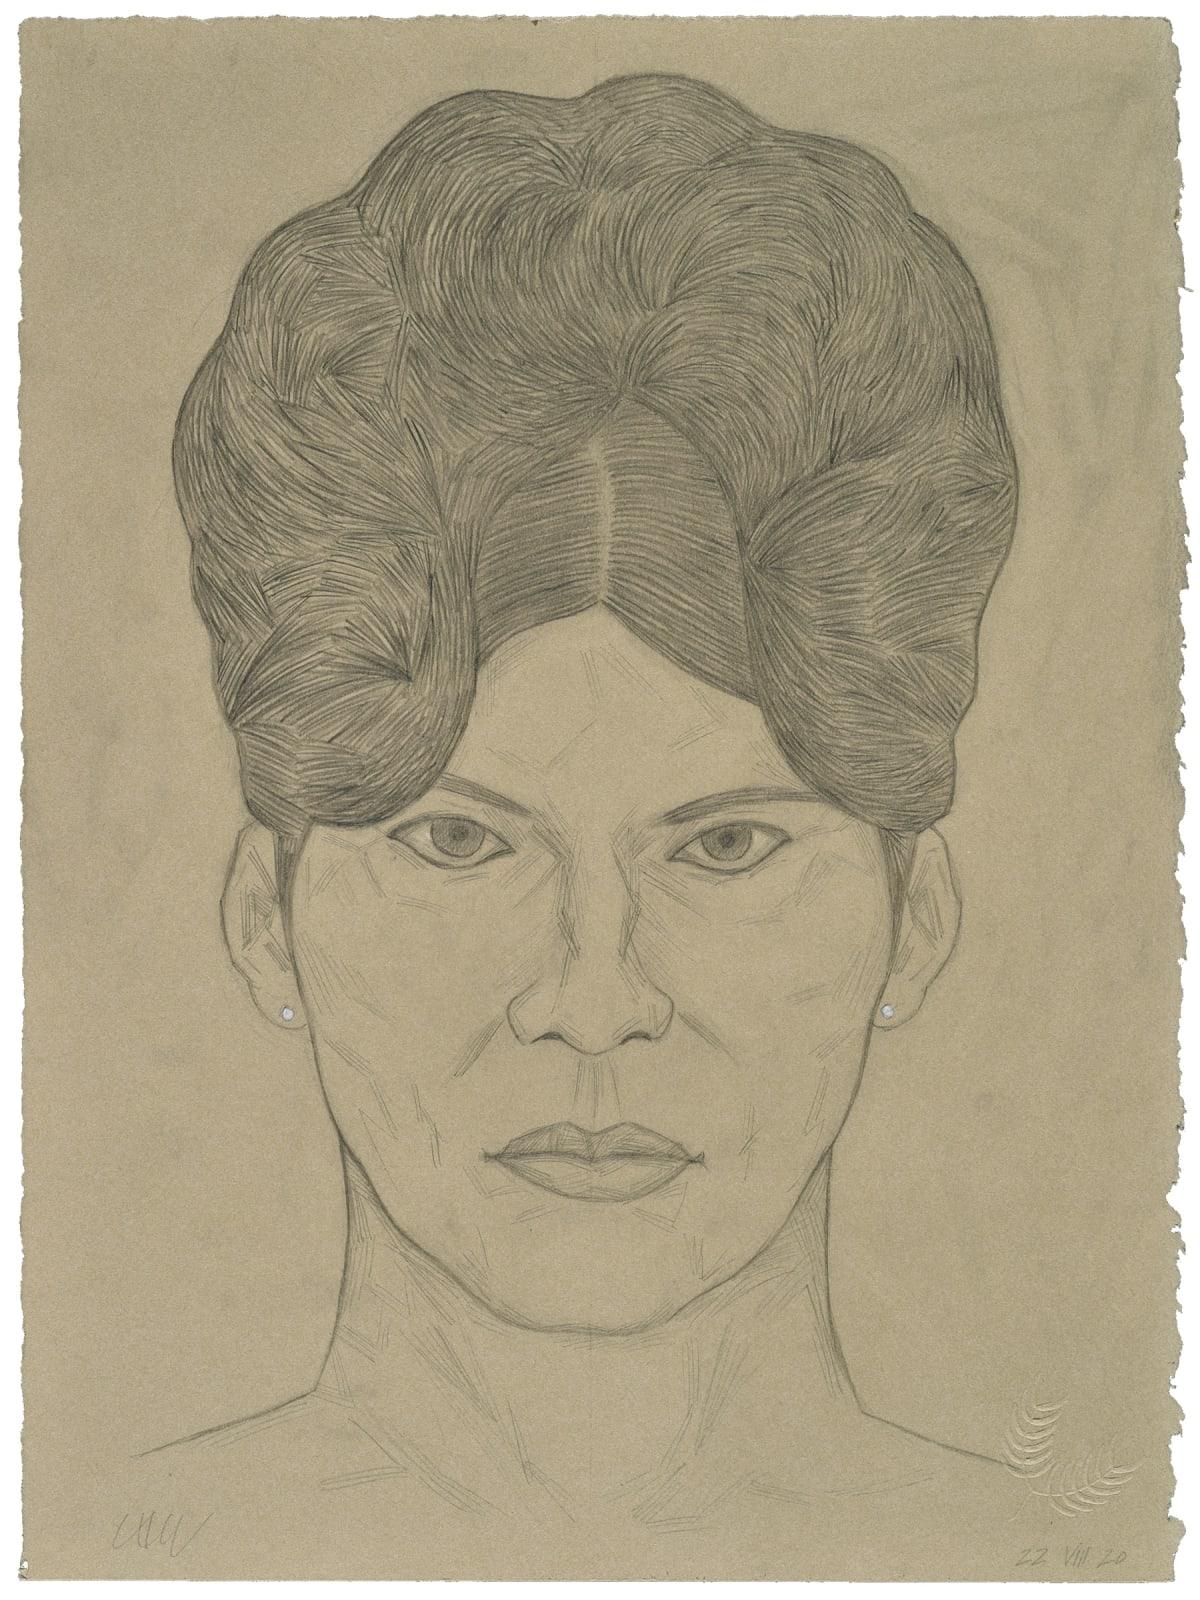 César A. Martínez Fulana, 2021 Graphite on Stonehenge paper 15 x 11 in 38.1 x 27.9 cm